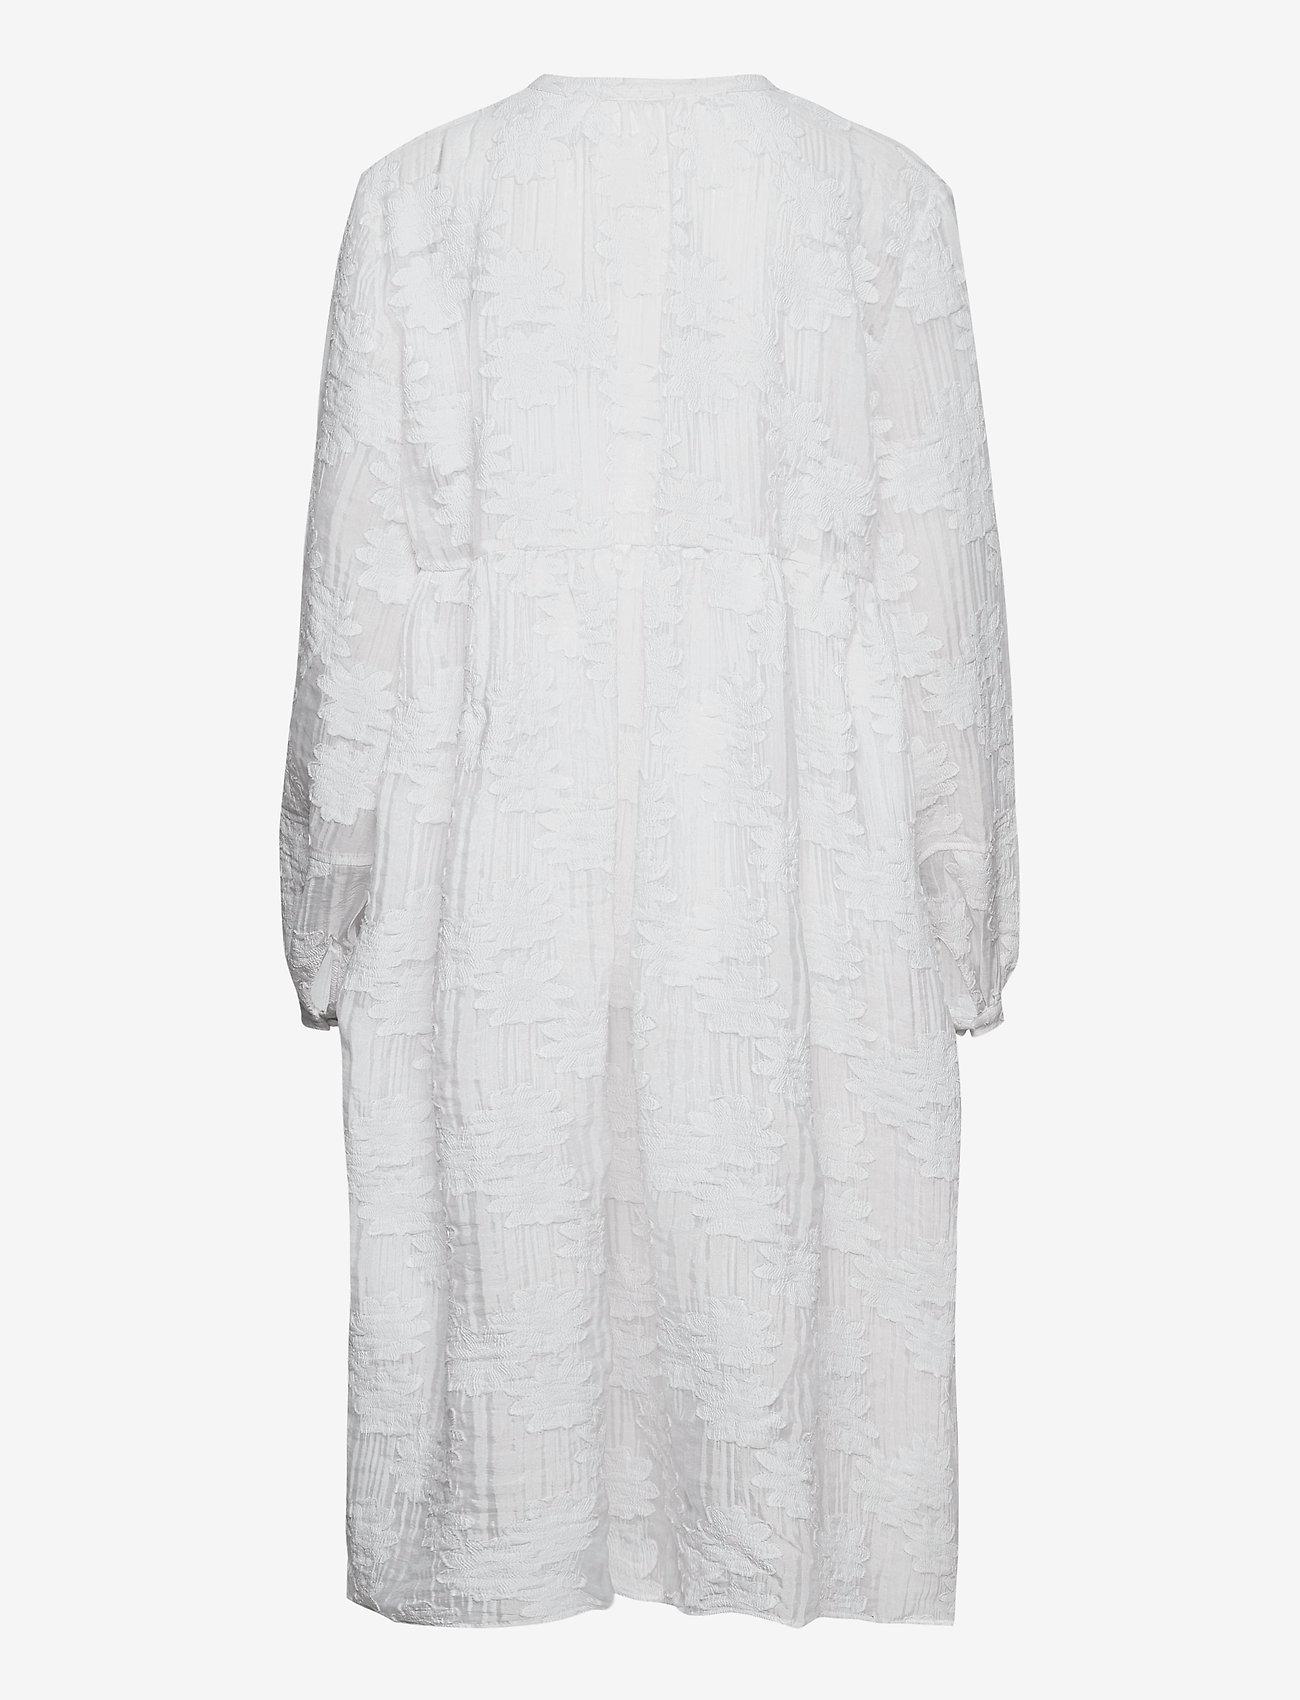 Samsøe Samsøe - Mynthe dress 13049 - blondekjoler - bright white - 1